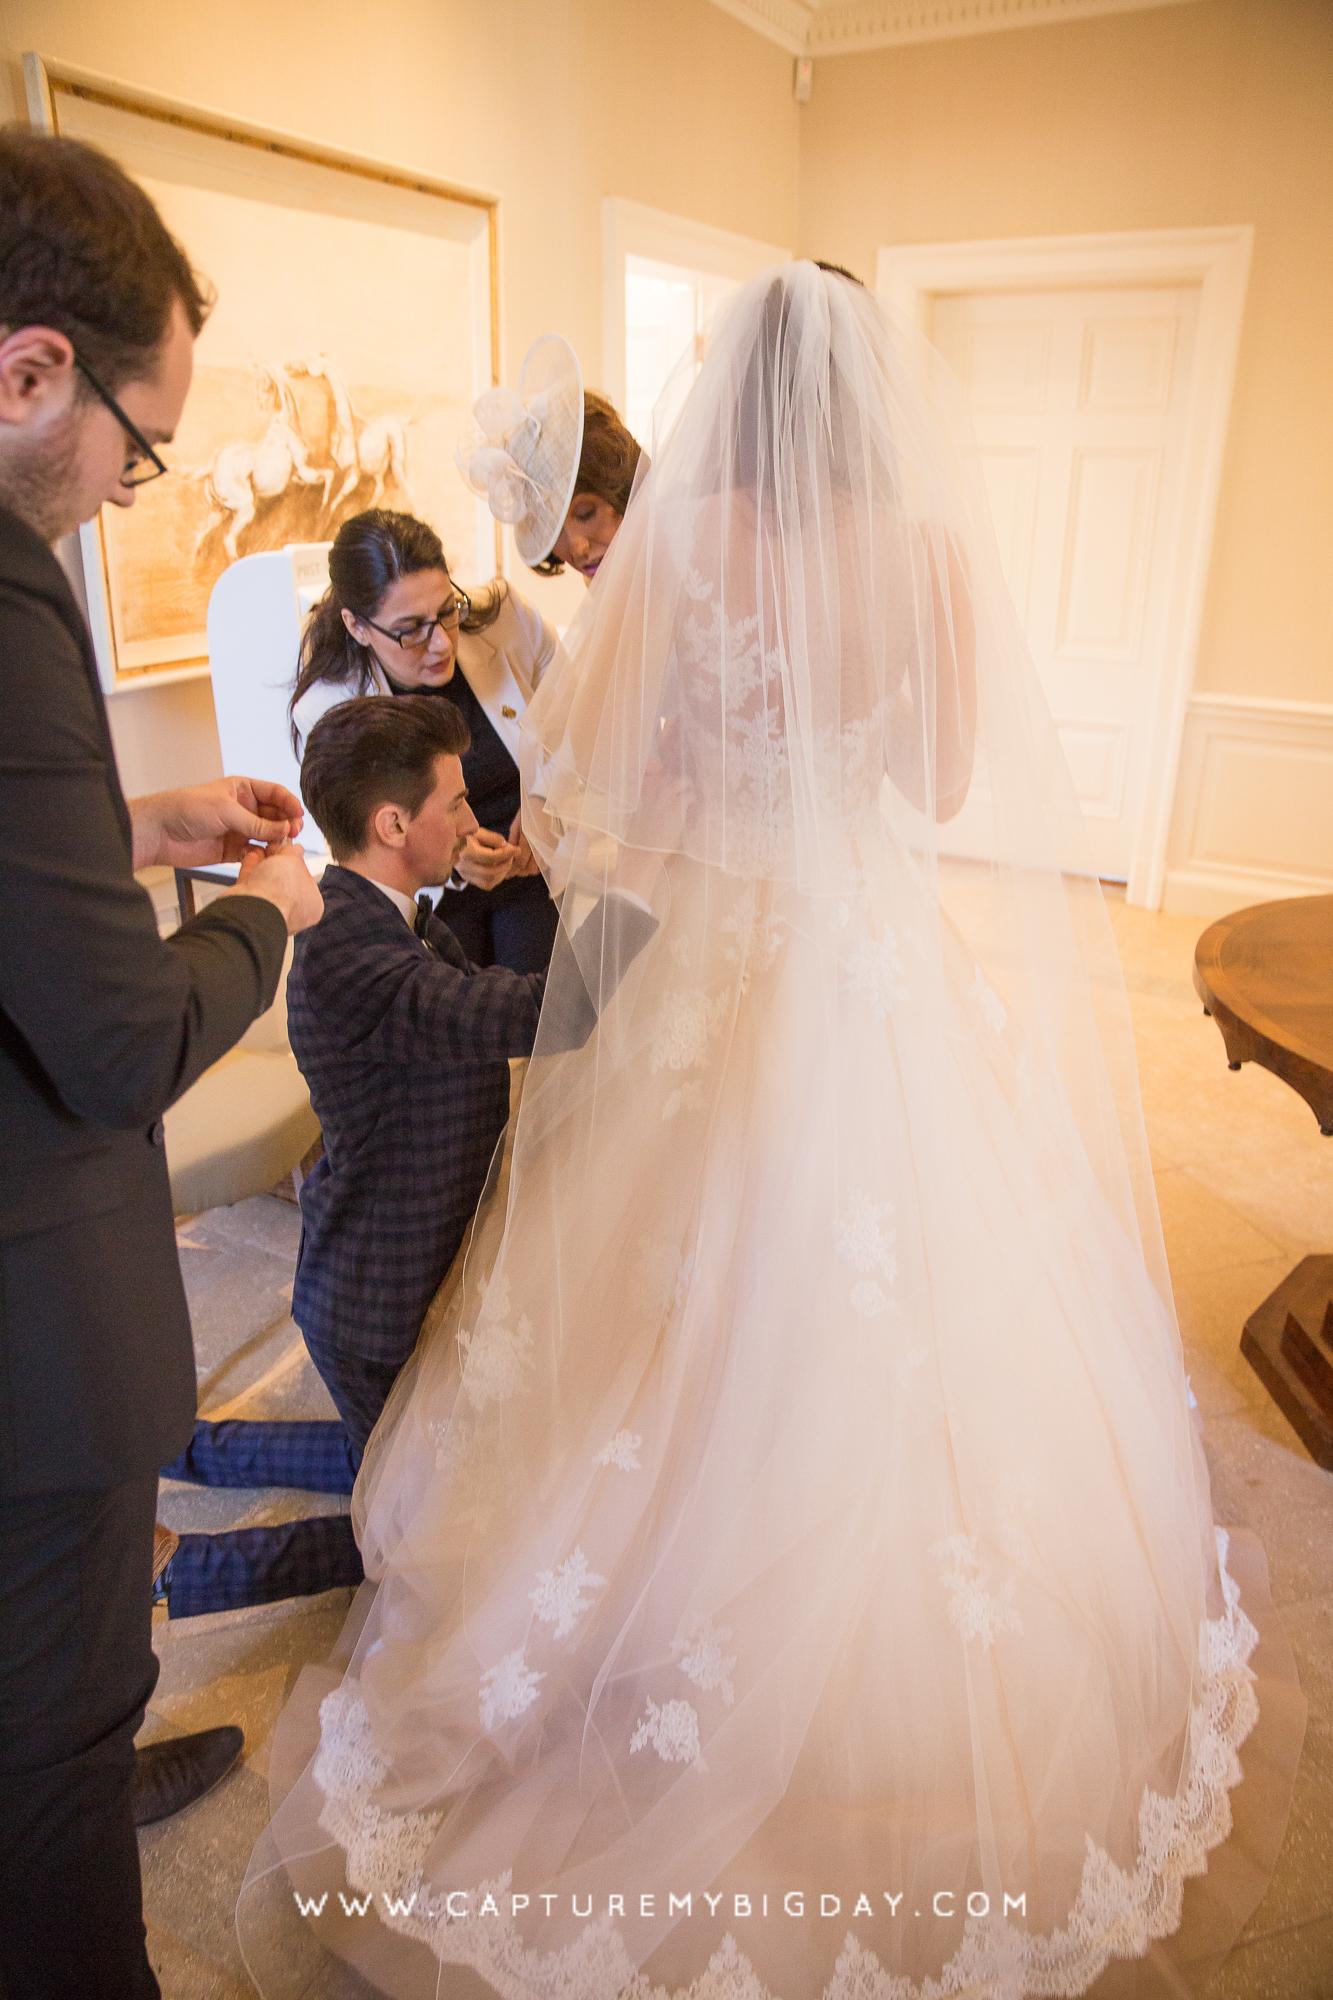 fixing the wedding dress